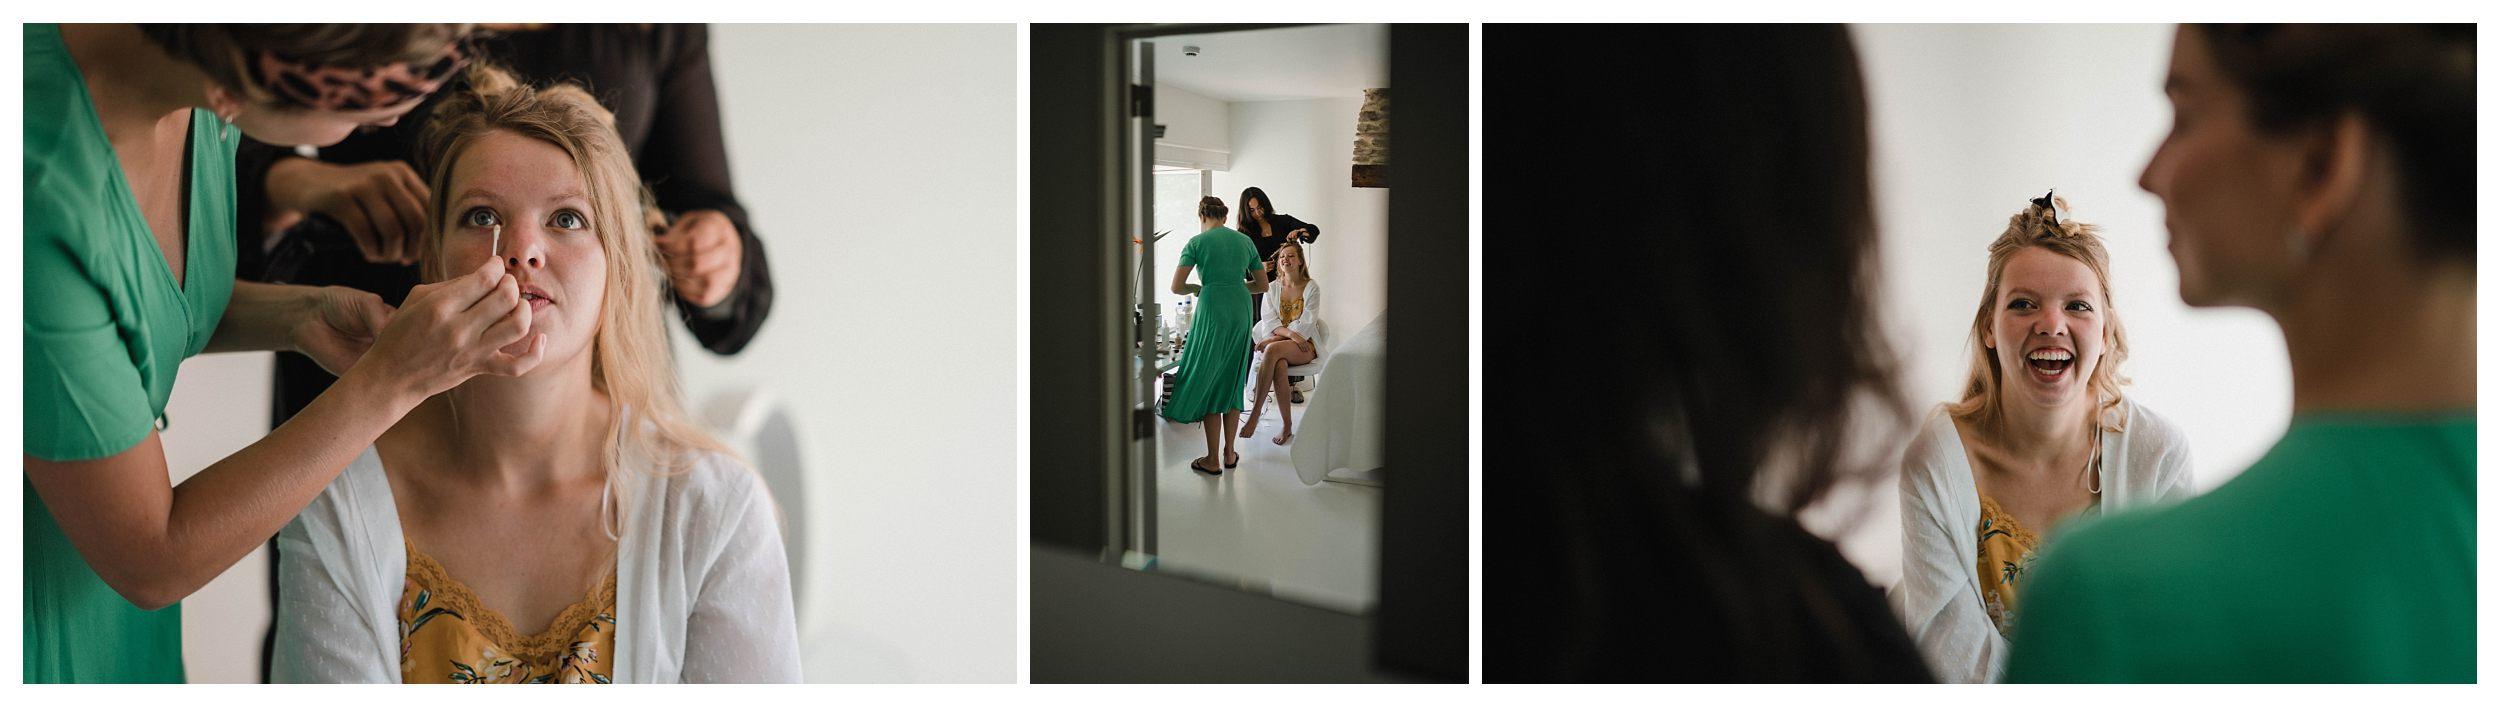 huwelijksfotograaf bruidsfotograaf destinationwedding huwelijksfotografie in ardennen nederland (10).jpg